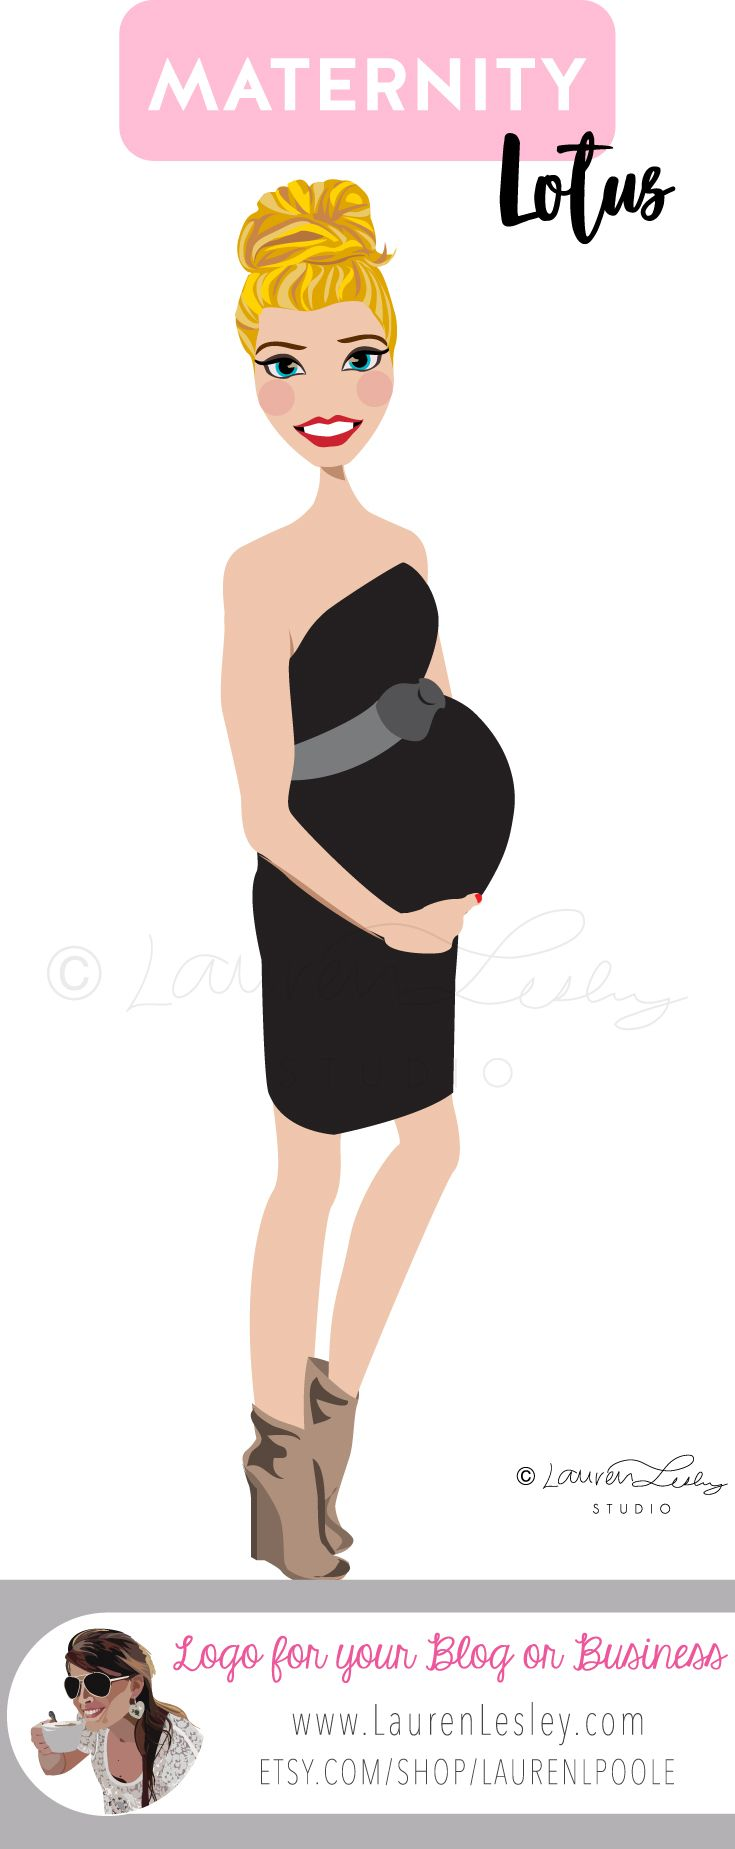 Maternity Portrait   New Mom   Pregnant Lady   Pregnant Woman   Pregnancy Logo   Logo for Blogger   Influencer Logo   Clip Art   Illustration   Design   Avatar   Custom Personalized Maternity Logo